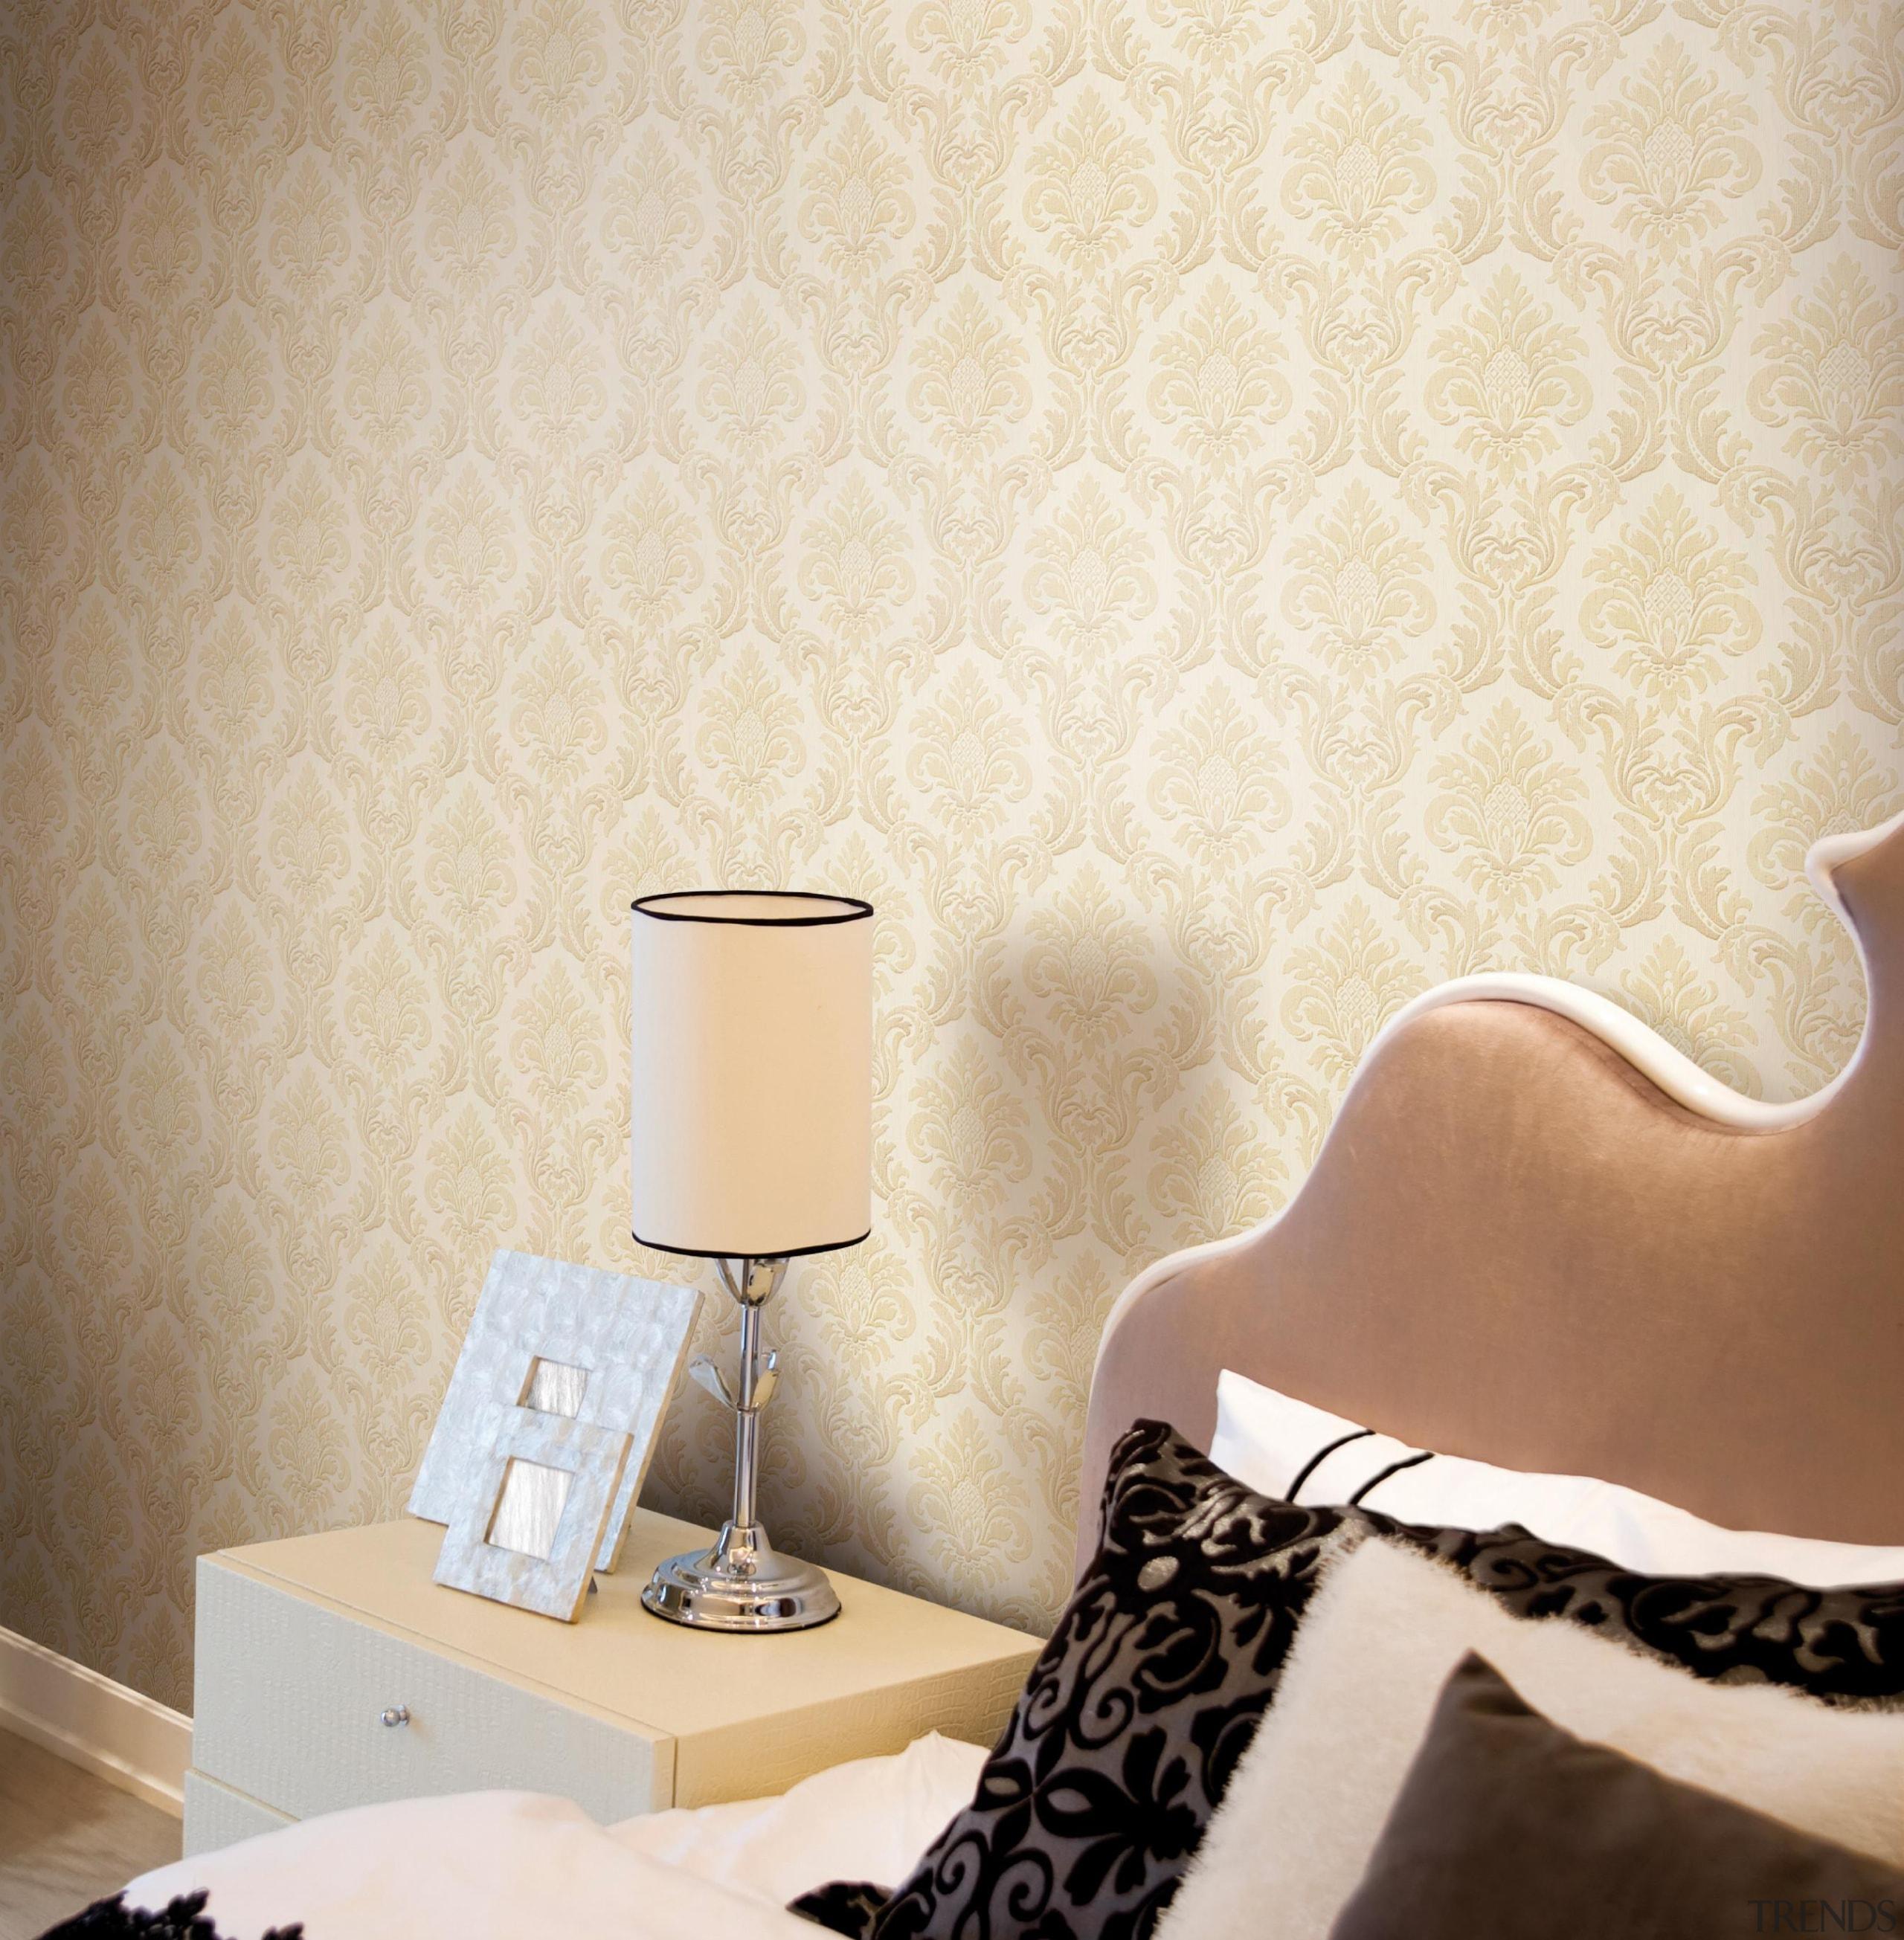 New Belaggio Range - New Belaggio Range - decor, interior design, room, wall, wallpaper, orange